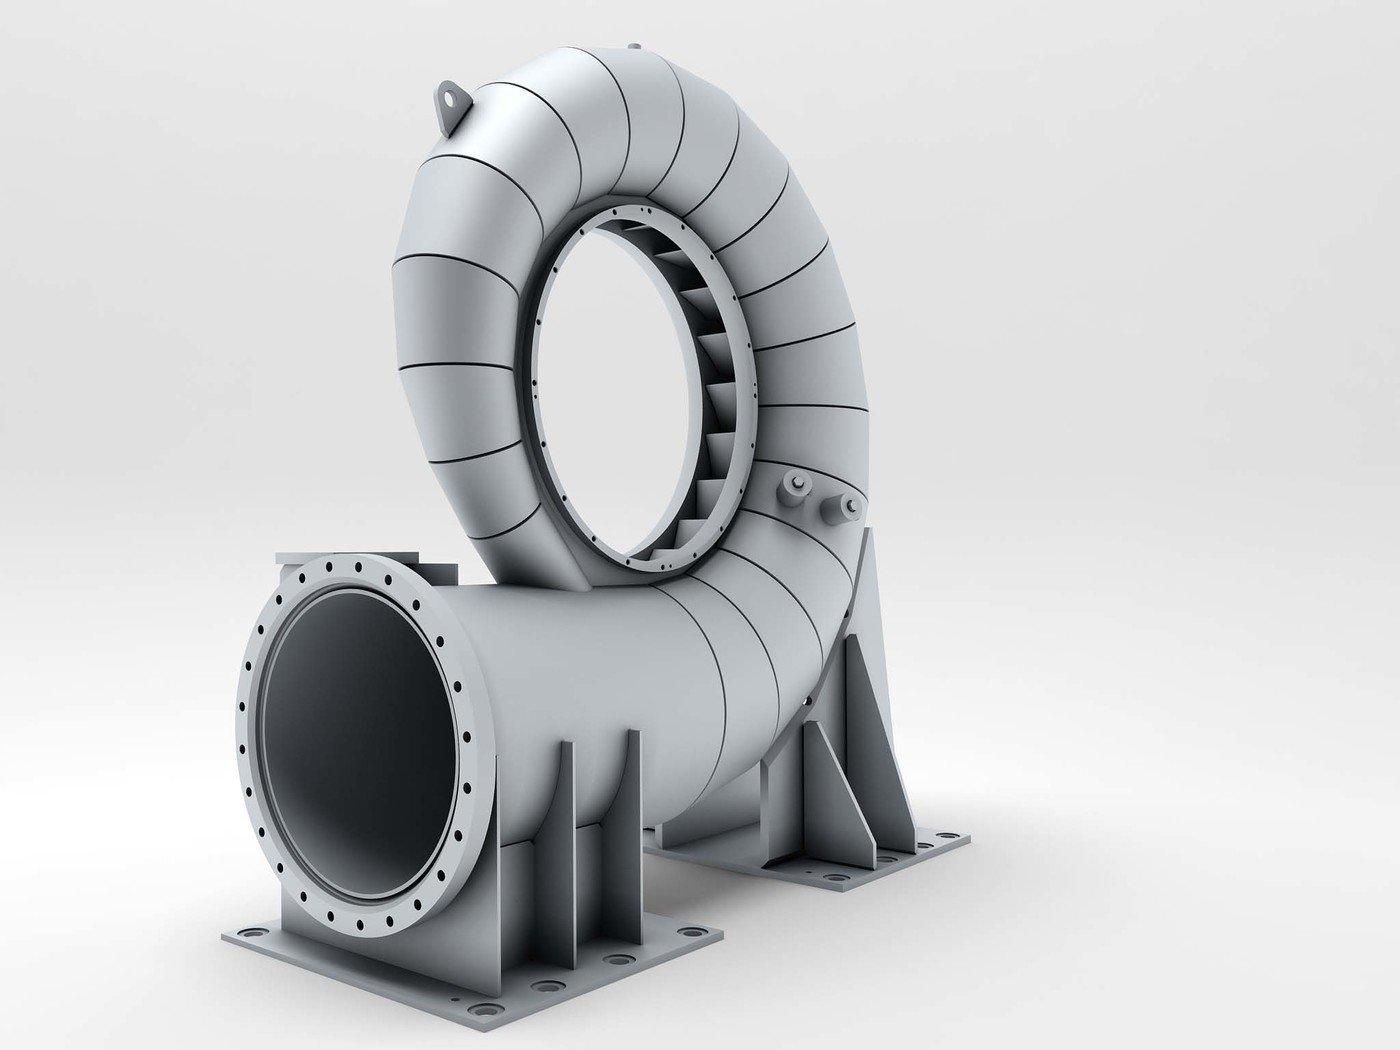 3D Industrial visualization by Basil Trunov at Coroflot com